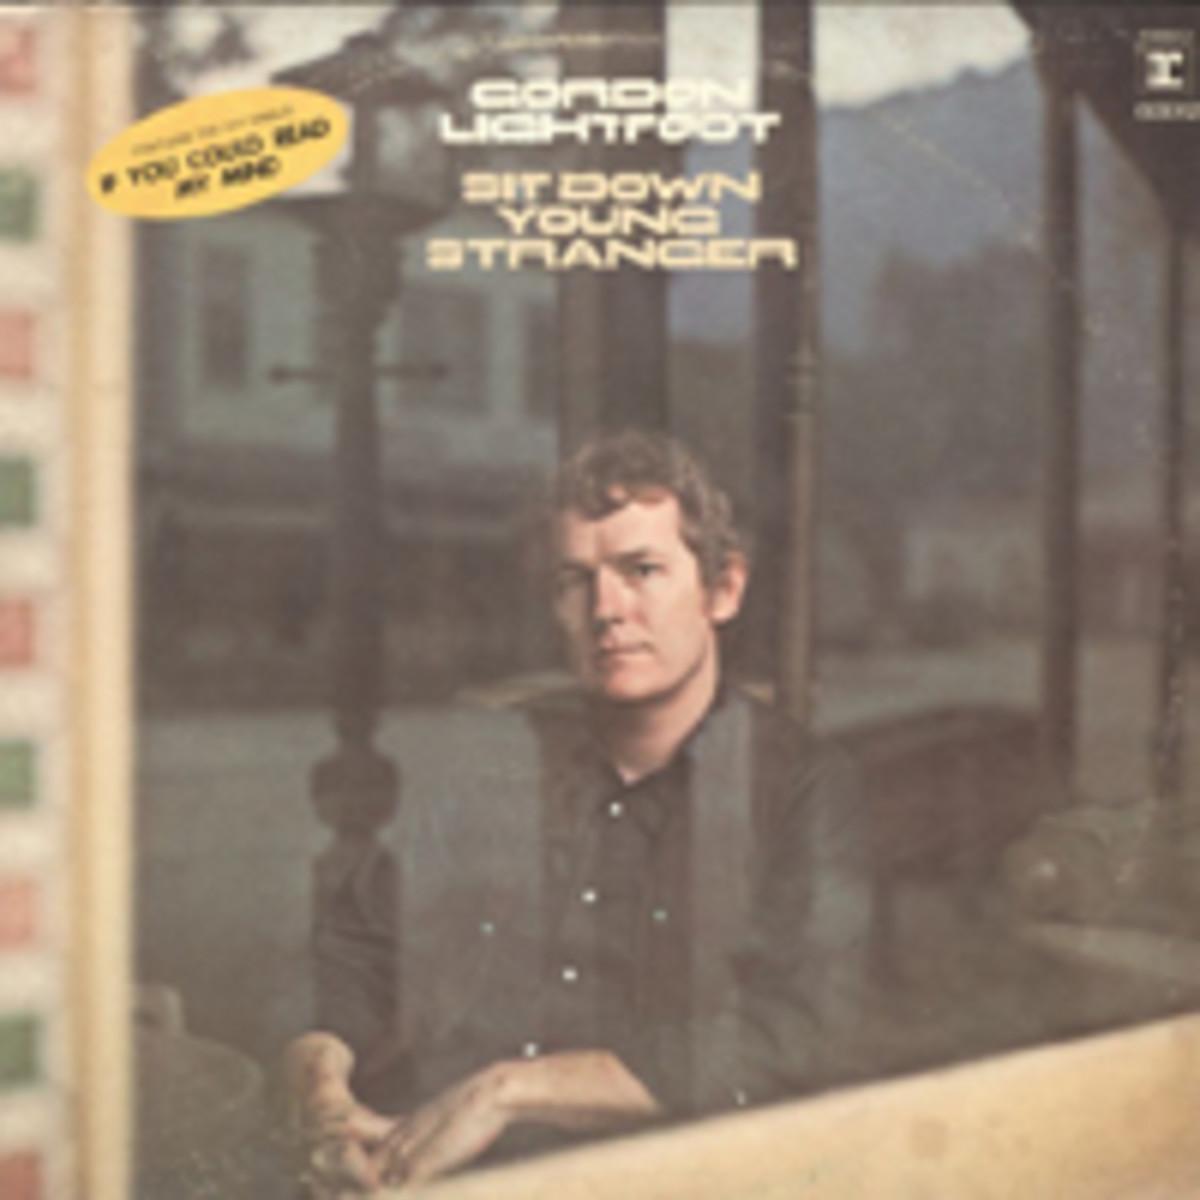 Gordon LIghtfoot Sit Down Young Stranger